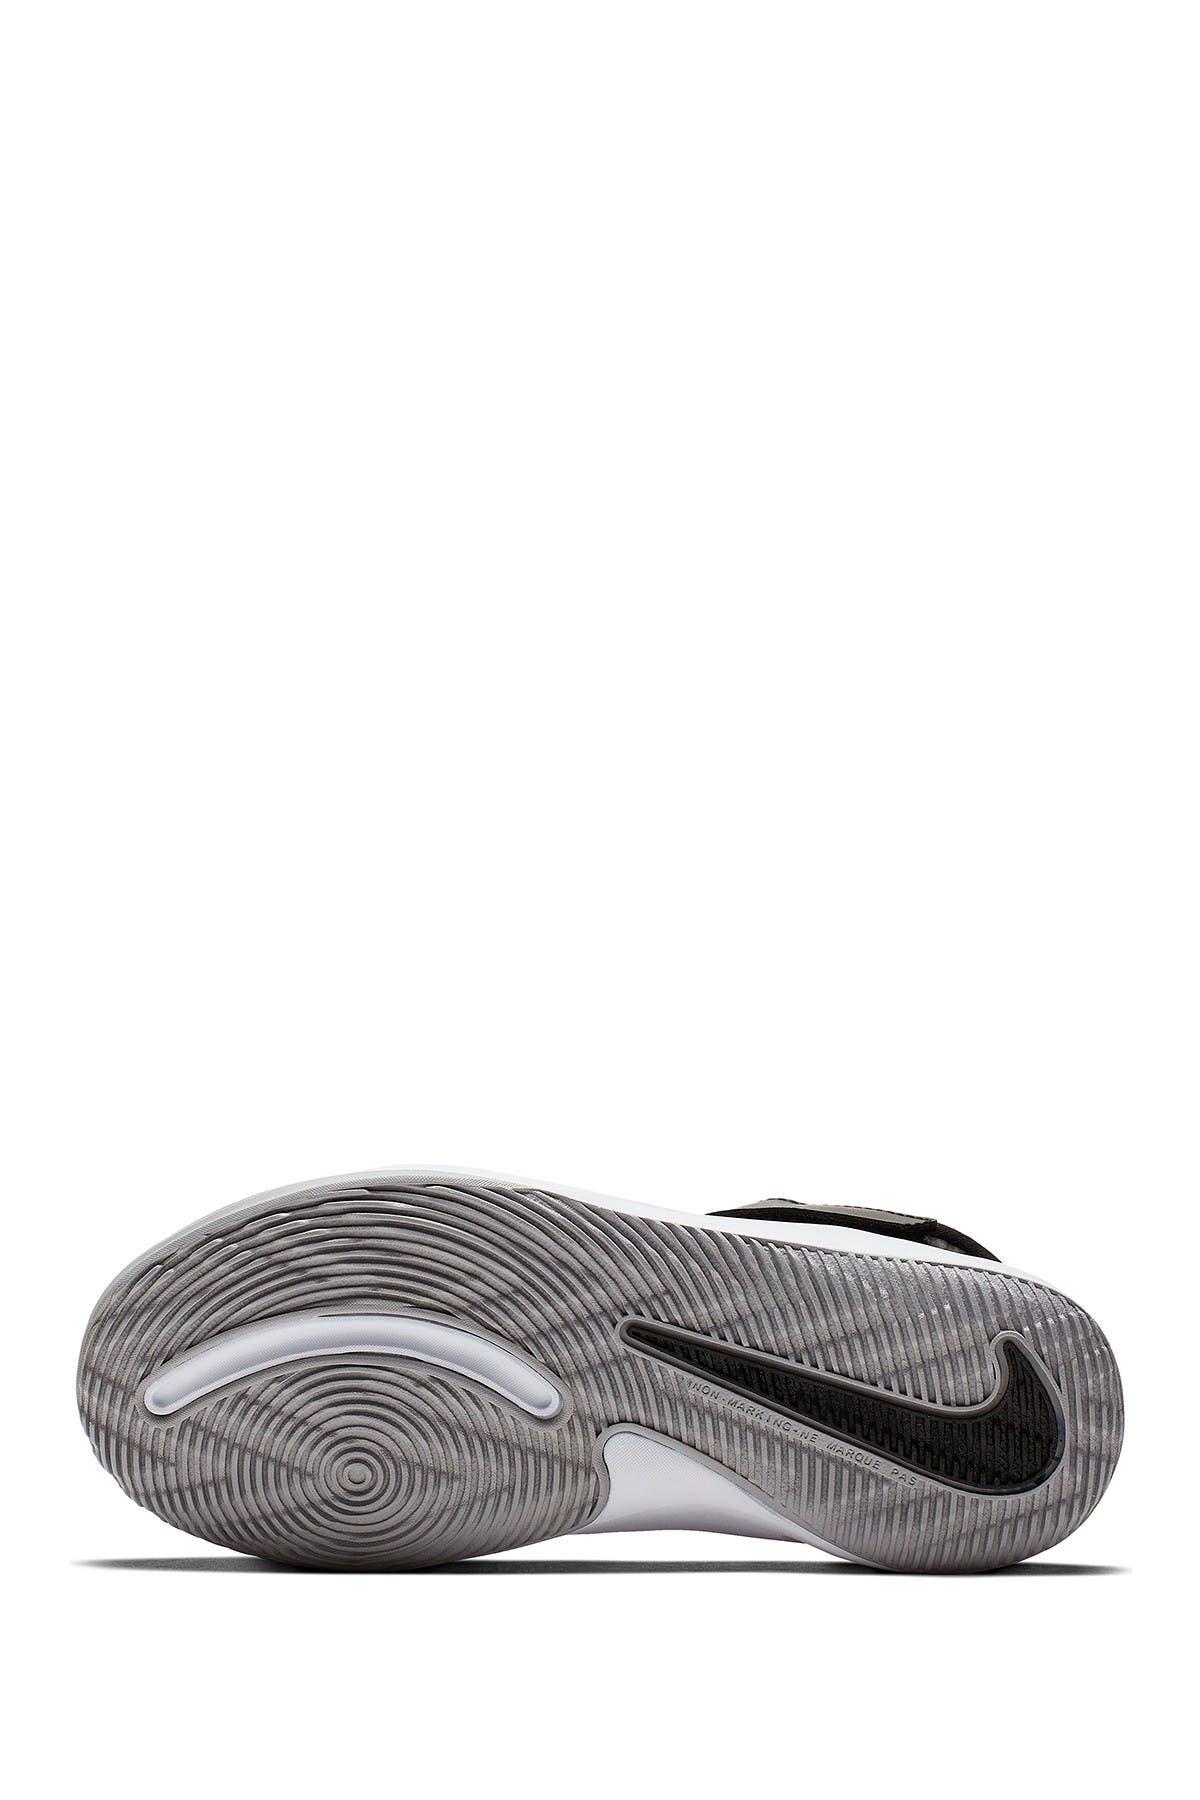 Image of Nike Team Hustle D 9 Sneaker